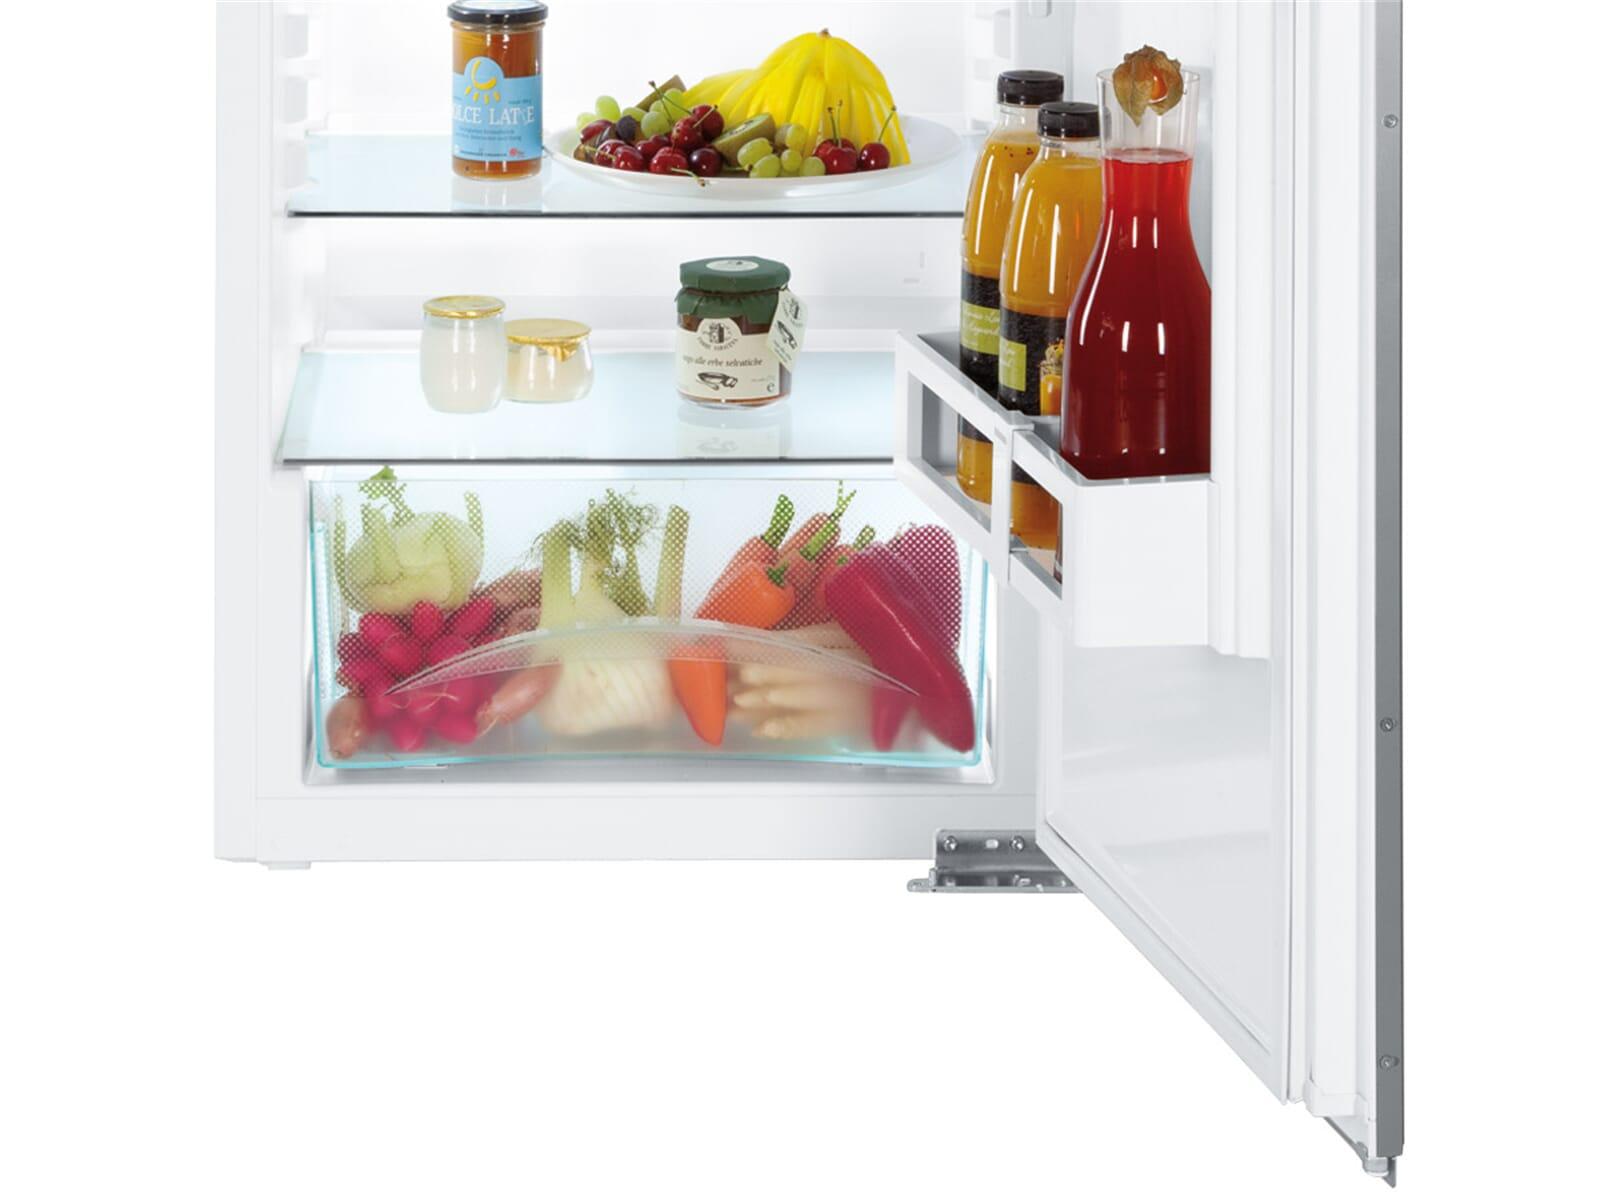 Aeg Unterbau Kühlschrank Dekorfähig : Liebherr ek comfort einbaukühlschrank